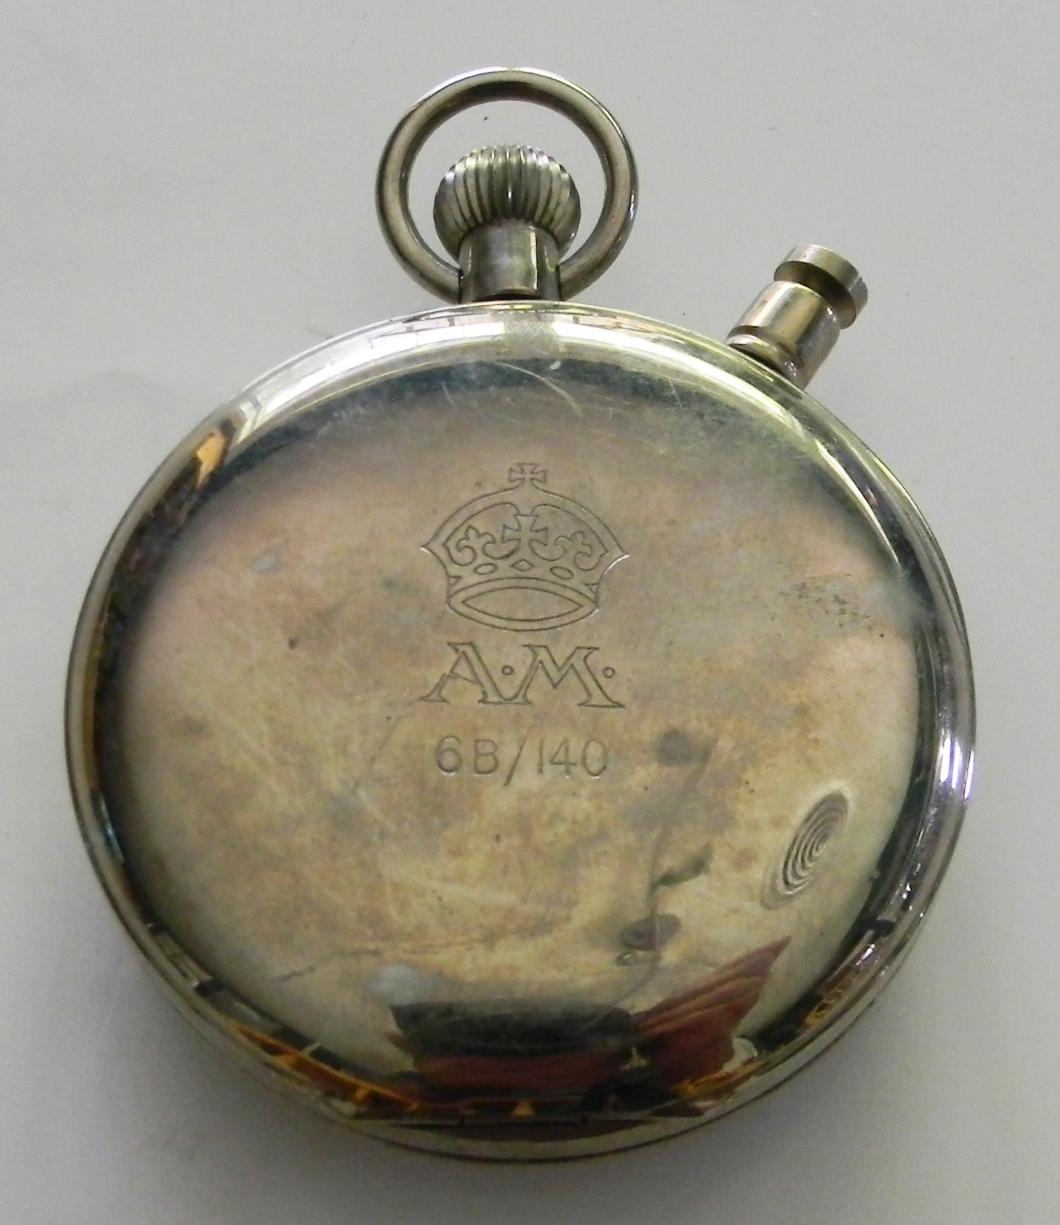 RAF observer stopwatch